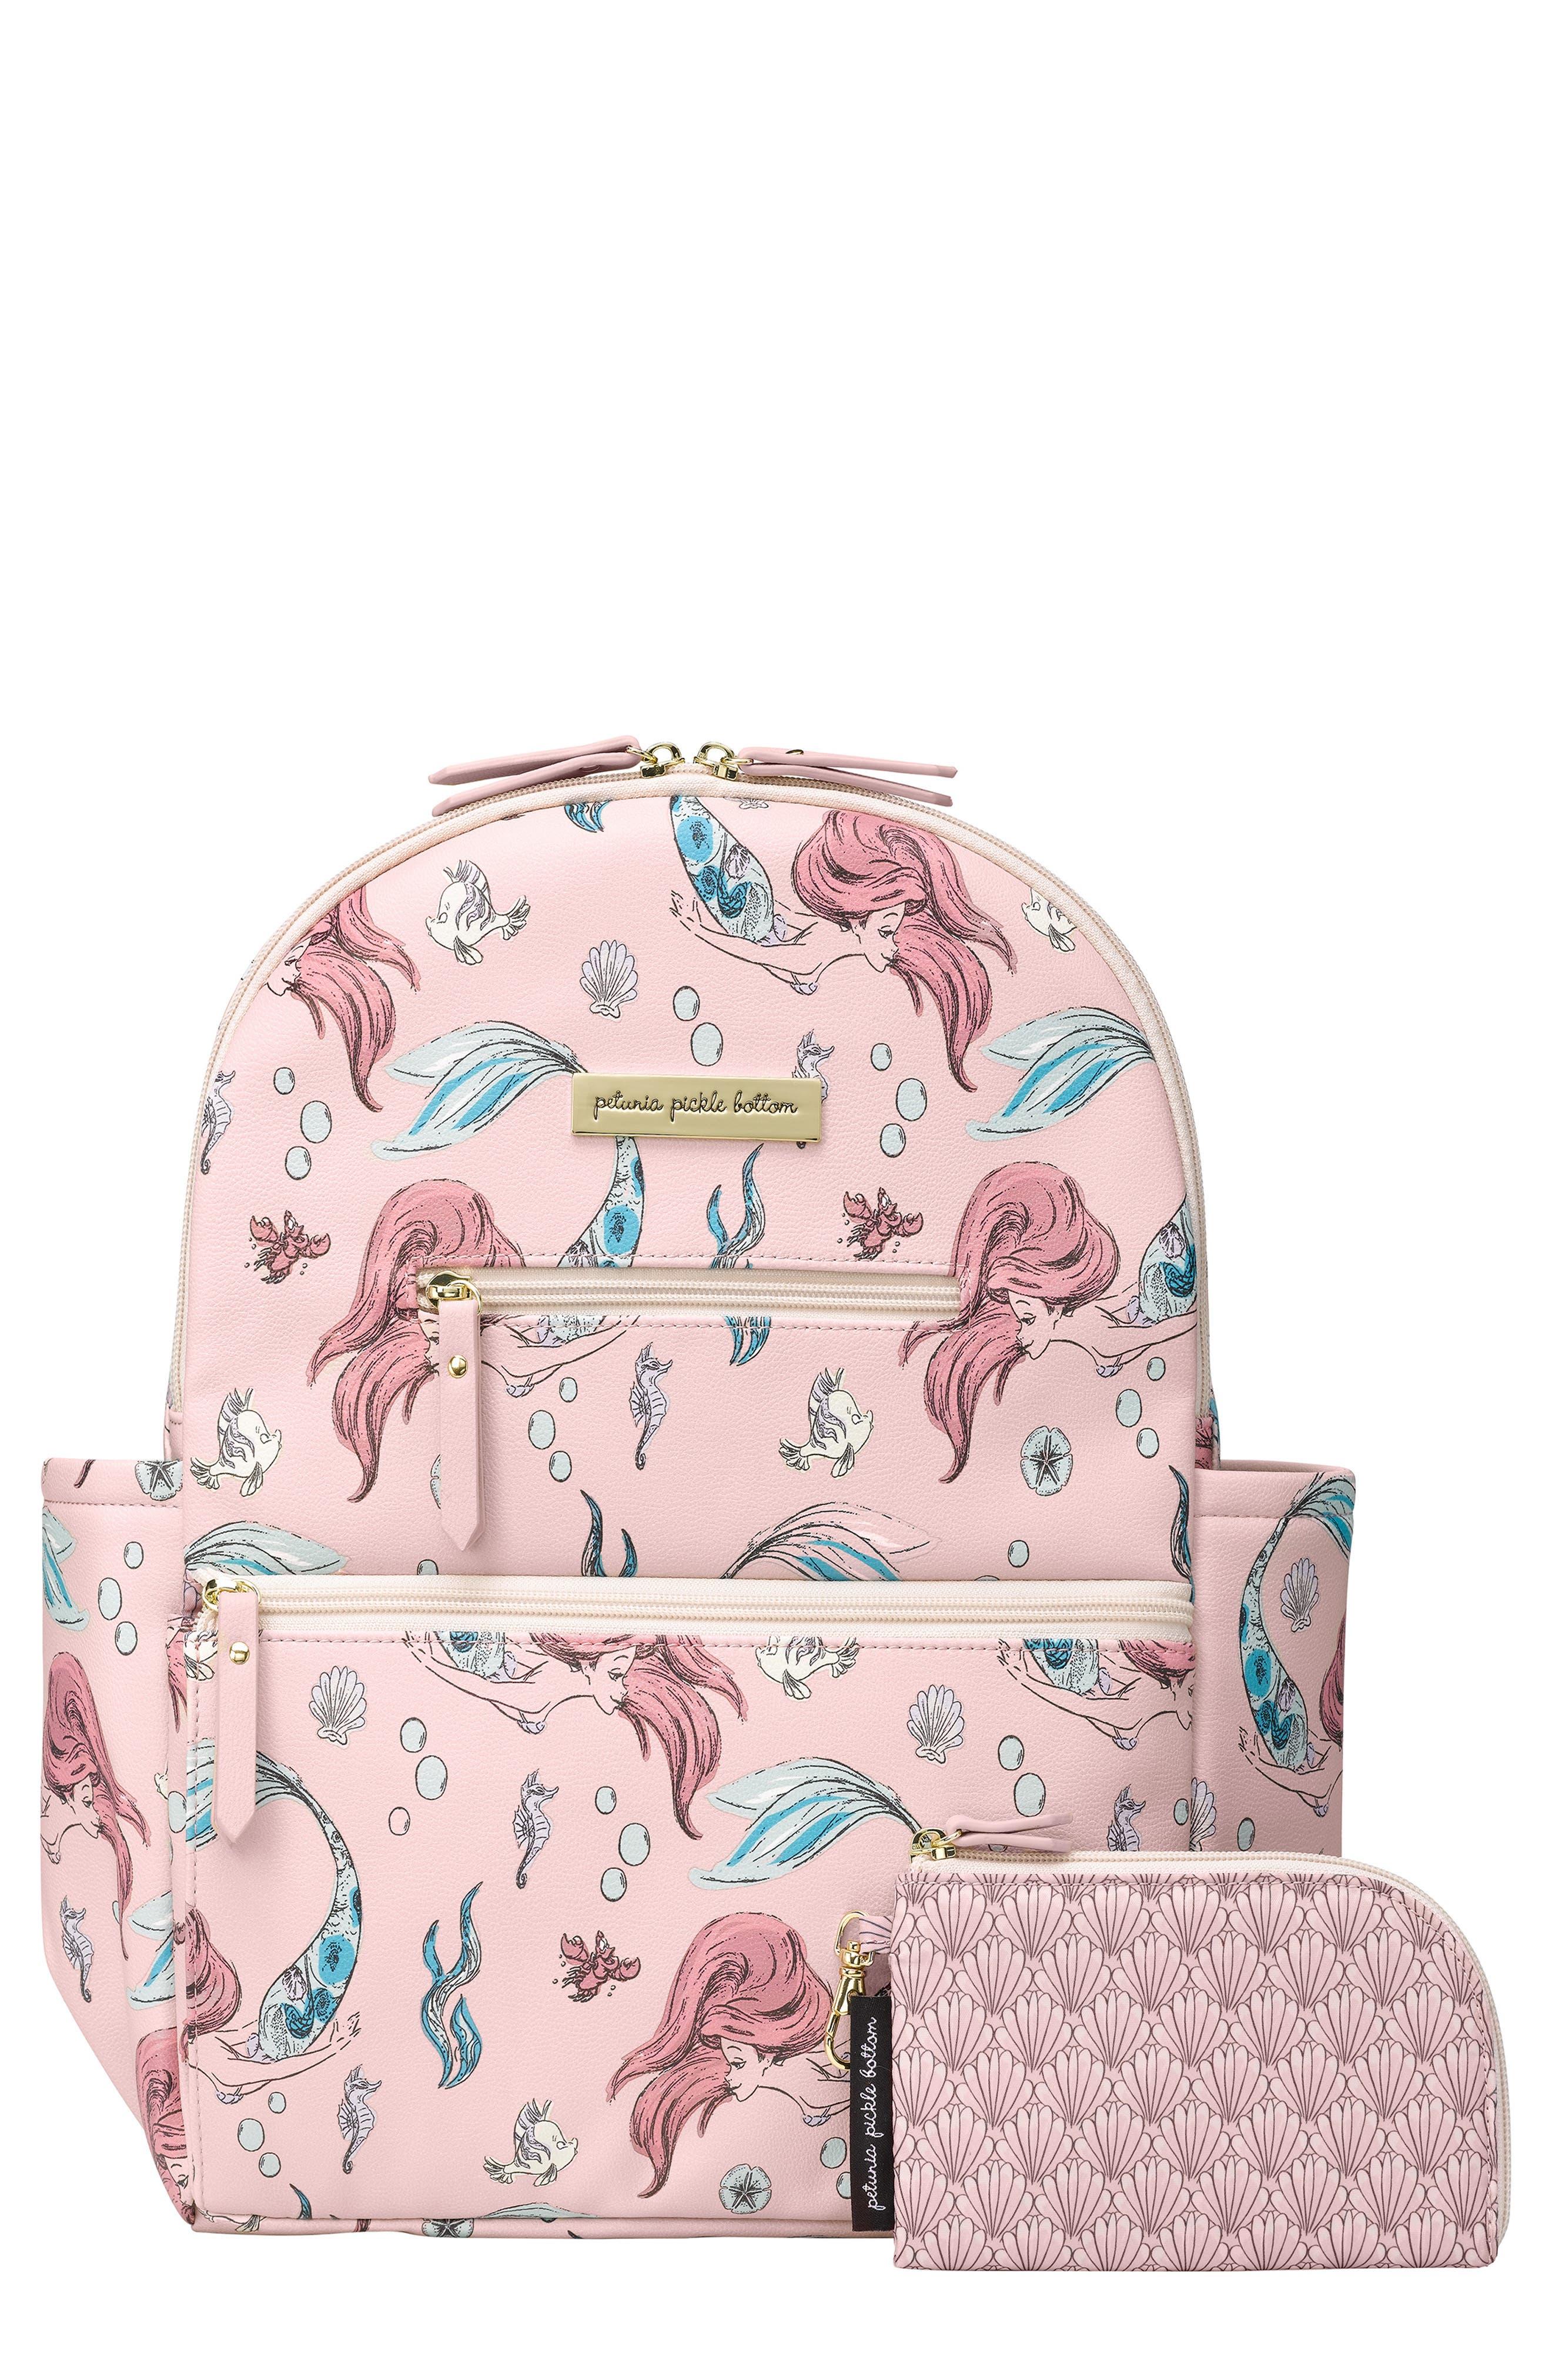 Infant Petunia Pickle Bottom X Disney Little Mermaid Ace Diaper Bag Backpack  Pink